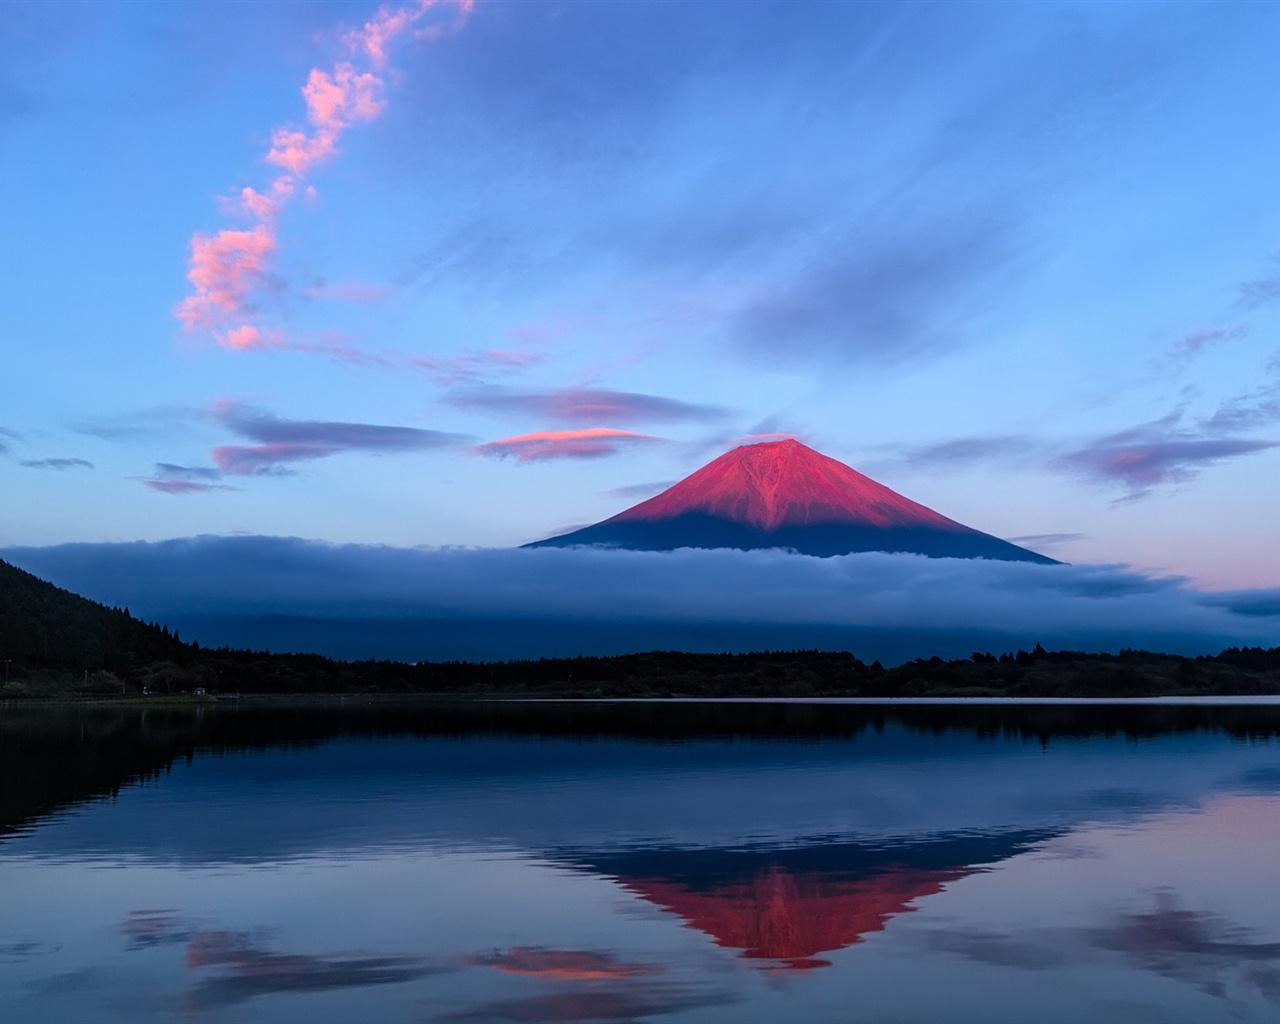 mountains sky lake reflection - photo #21